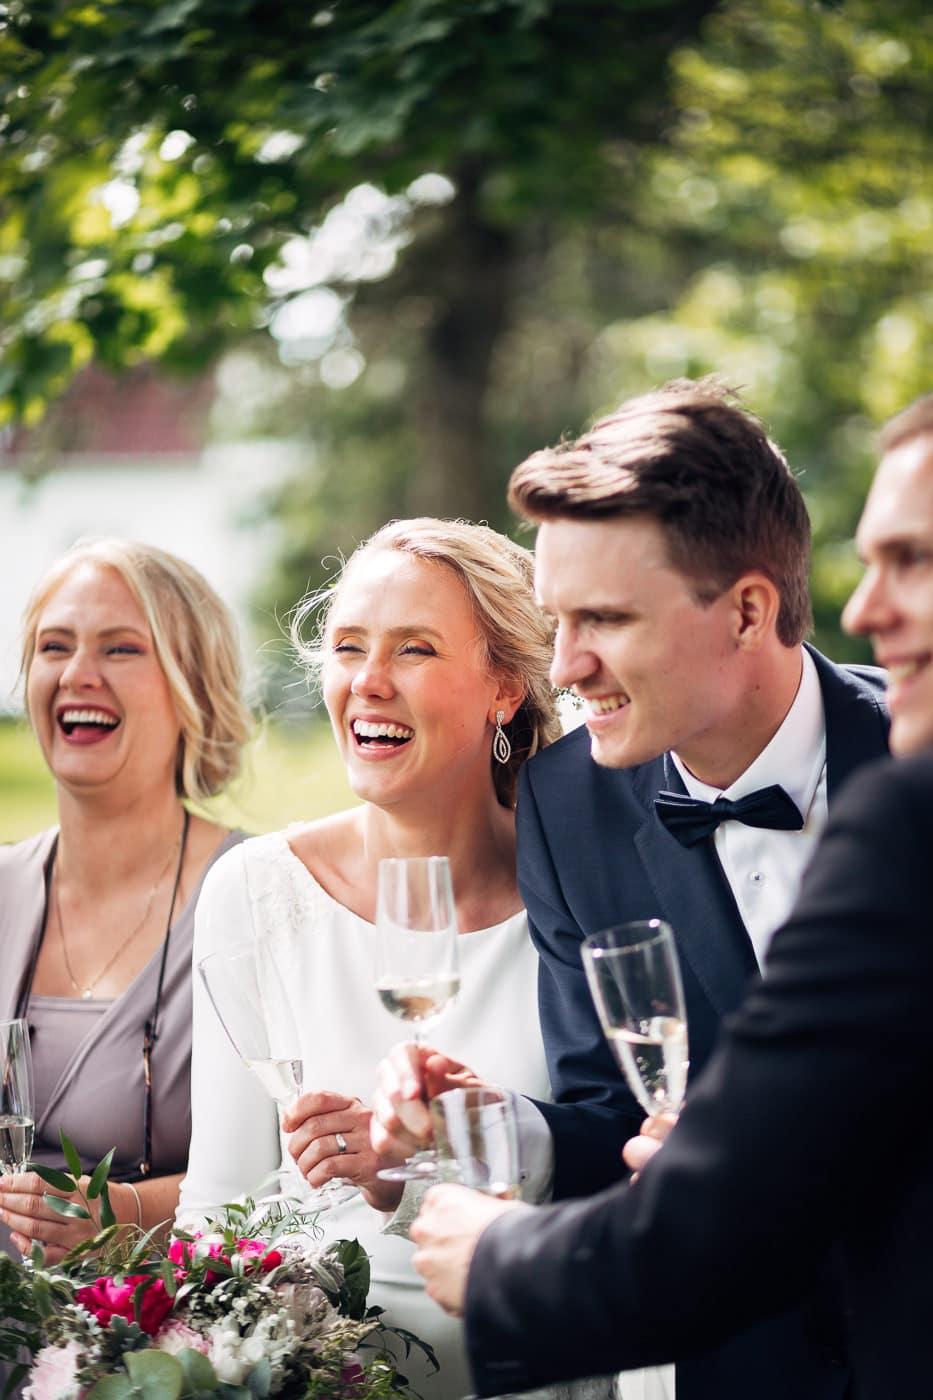 Karoline & Andreas - bryllup i Østfold med magiske detaljer Bryllup Fredrikstad Fotograf 46